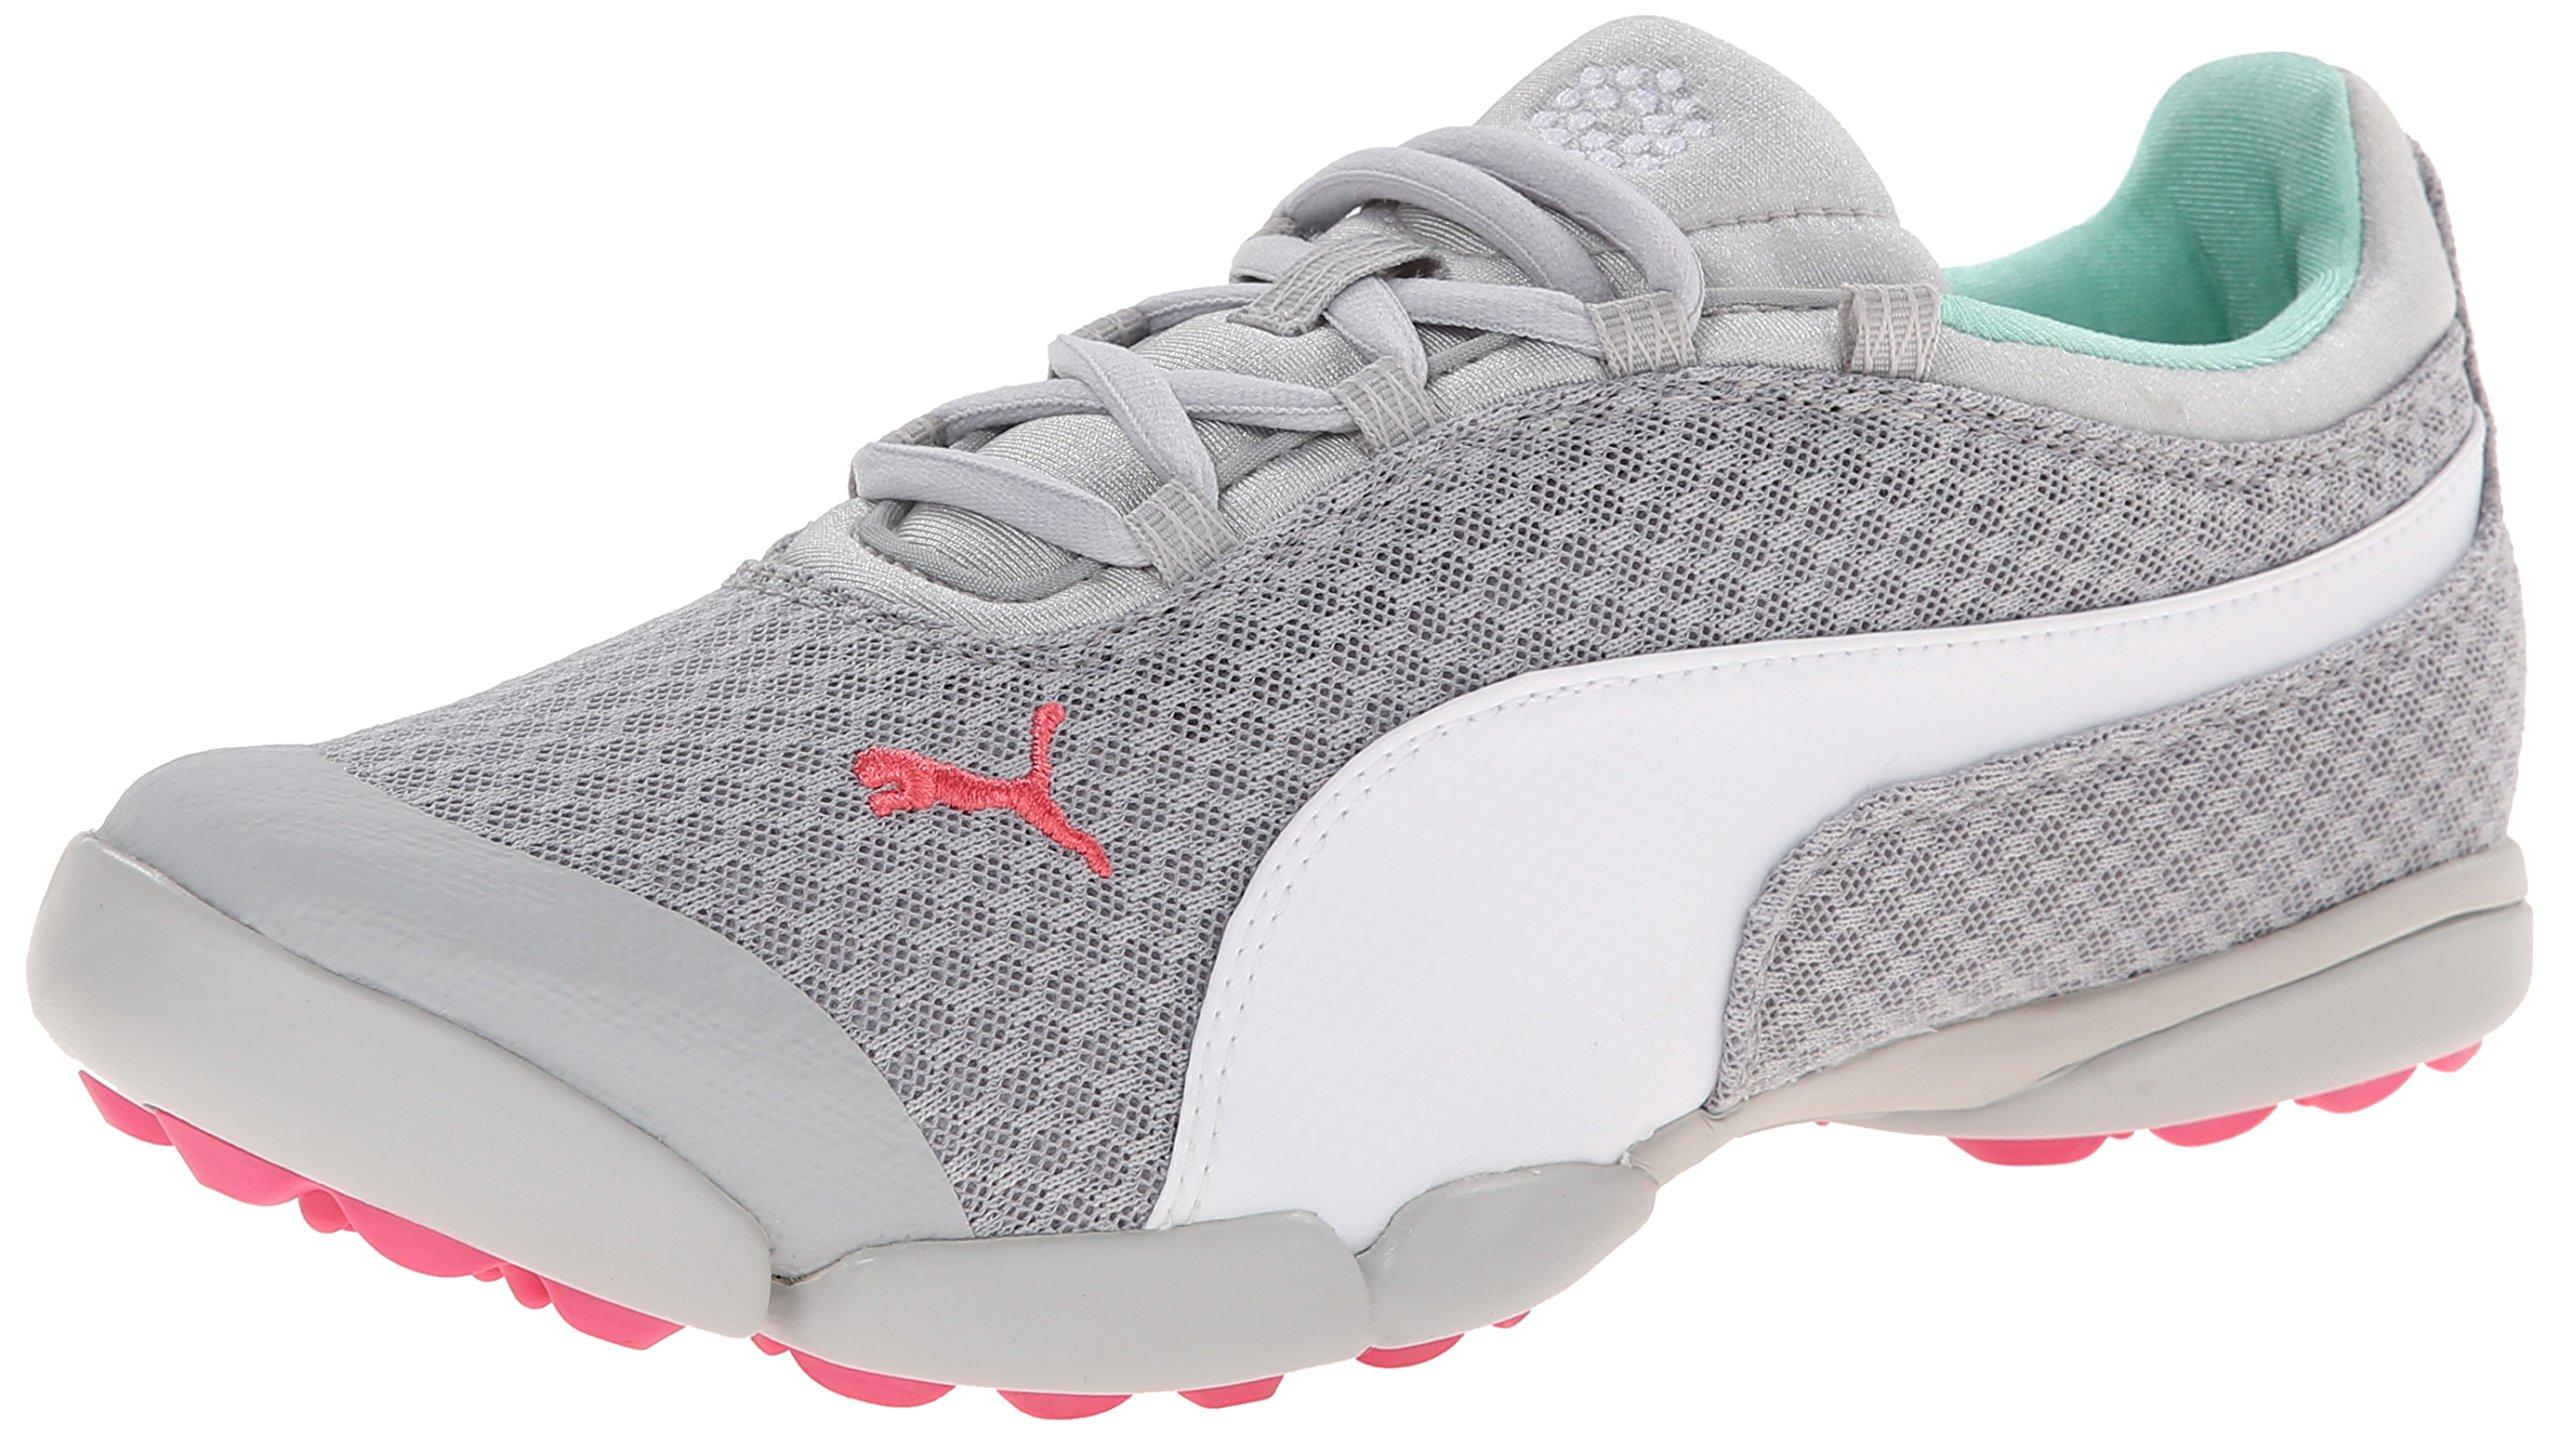 PUMA Women's Sunnylite Mesh Golf Shoe Spikeless, Vapor Blue/White/Camellia Rose, 6 M US